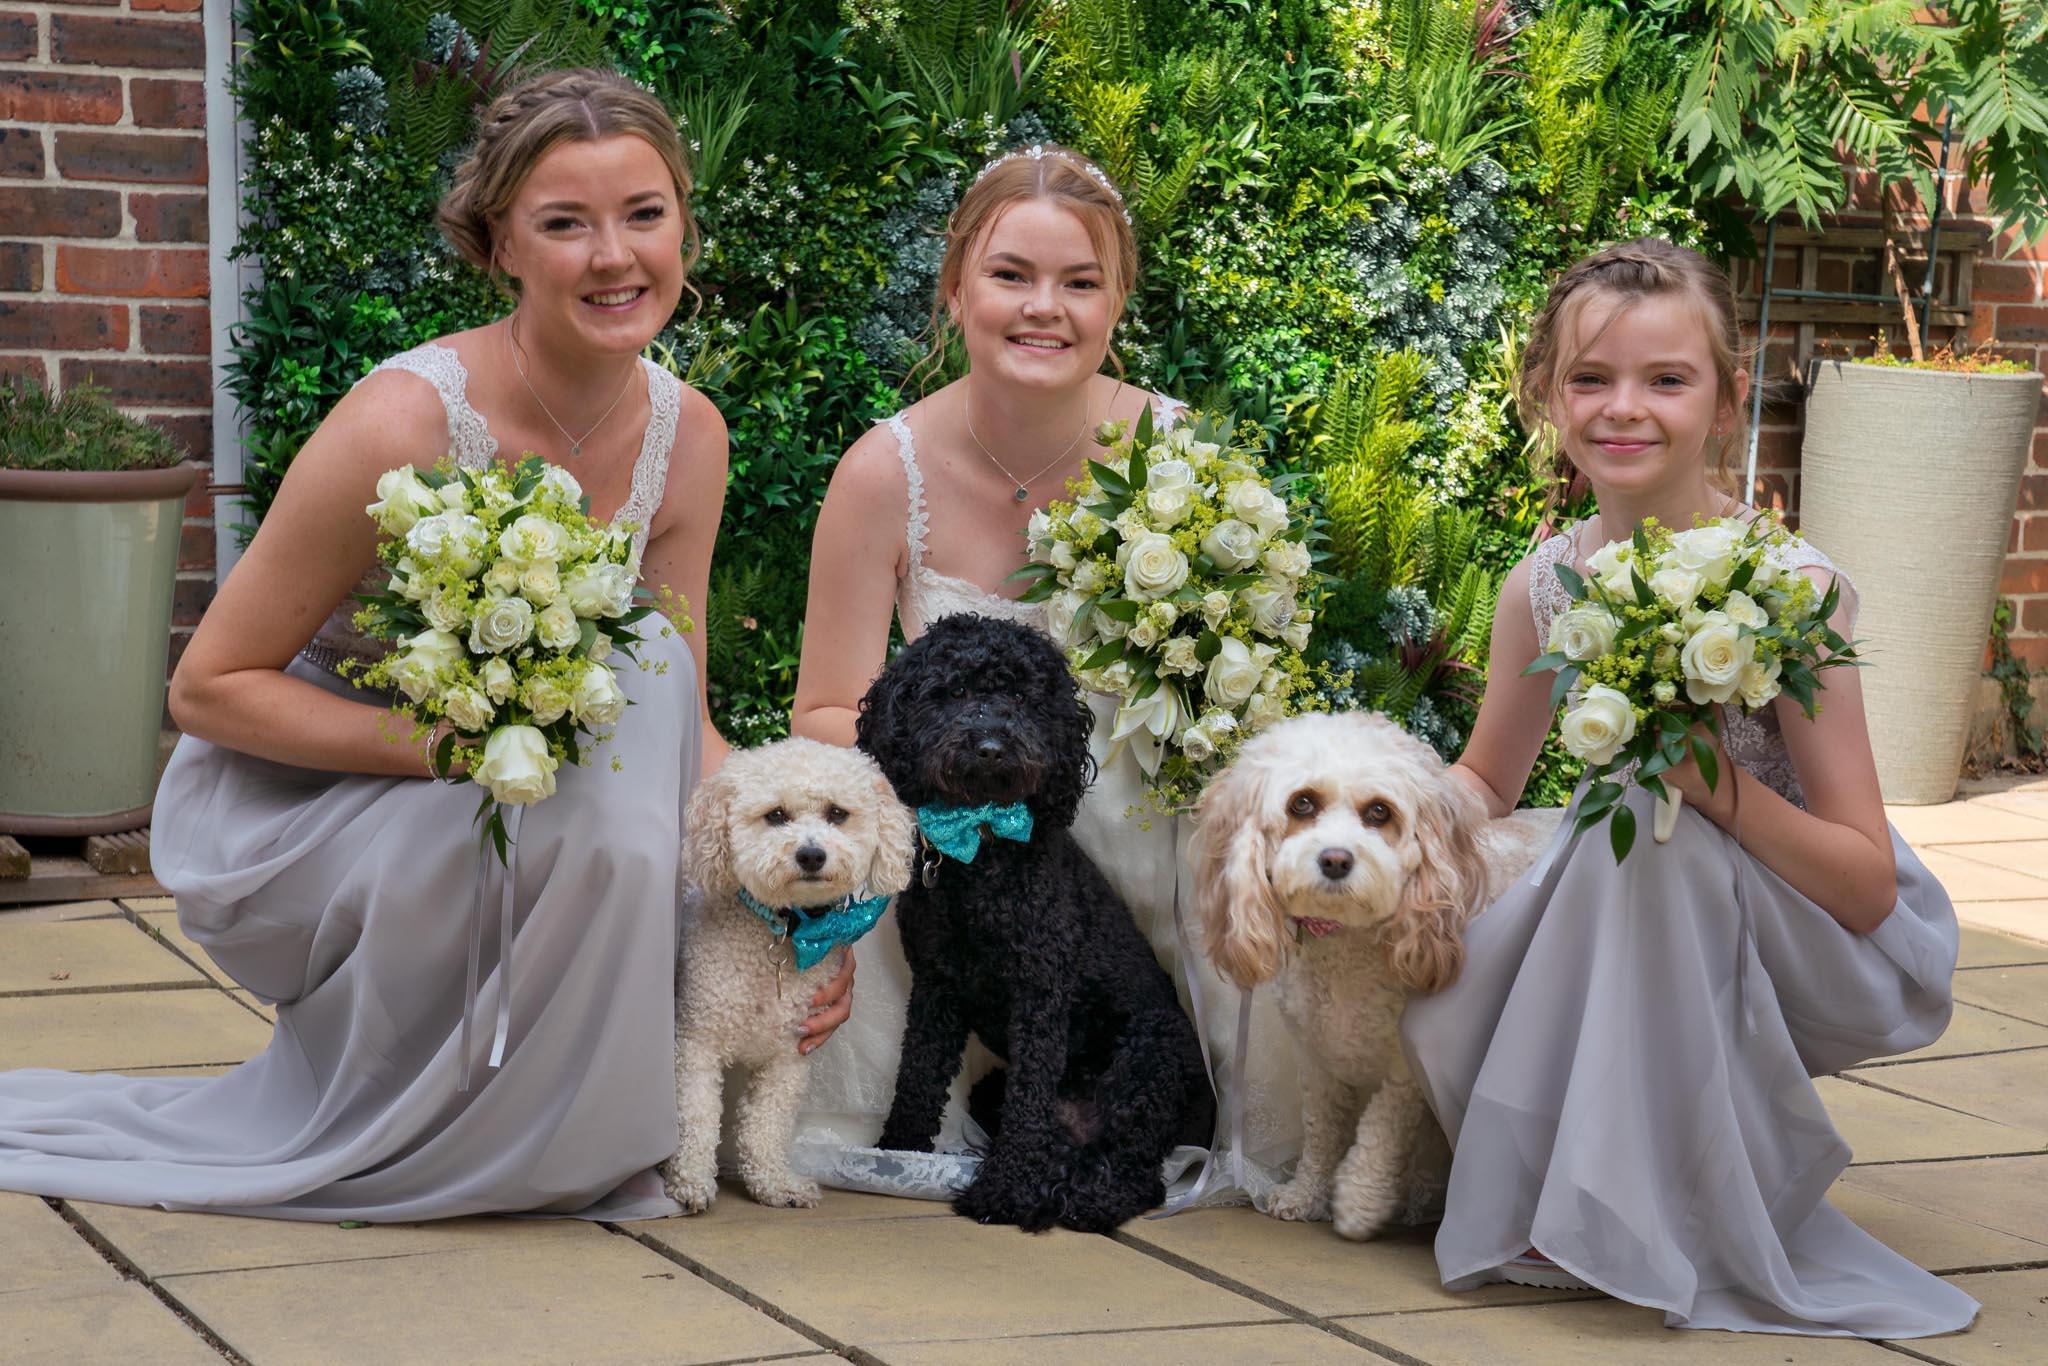 086-Preparations-Luke-Yasmin-The-Rayleigh-Club-Wedding-Photography.jpg